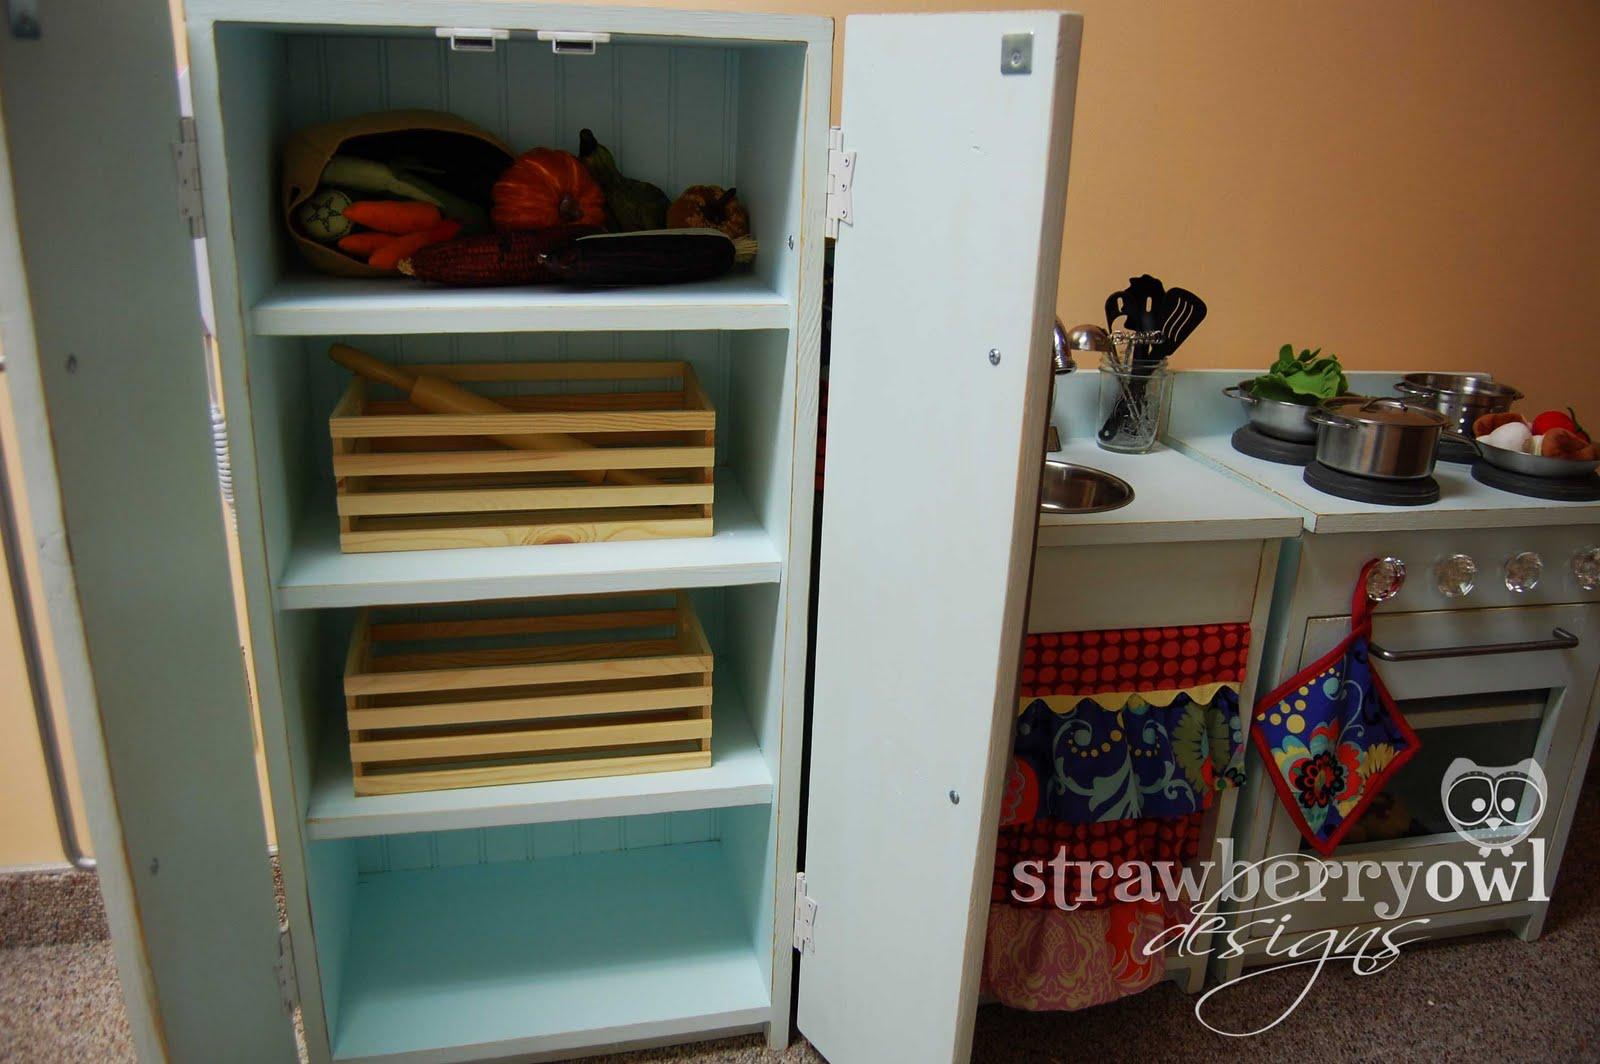 Strawberry owl designs little girls play kitchen for Girls play kitchen